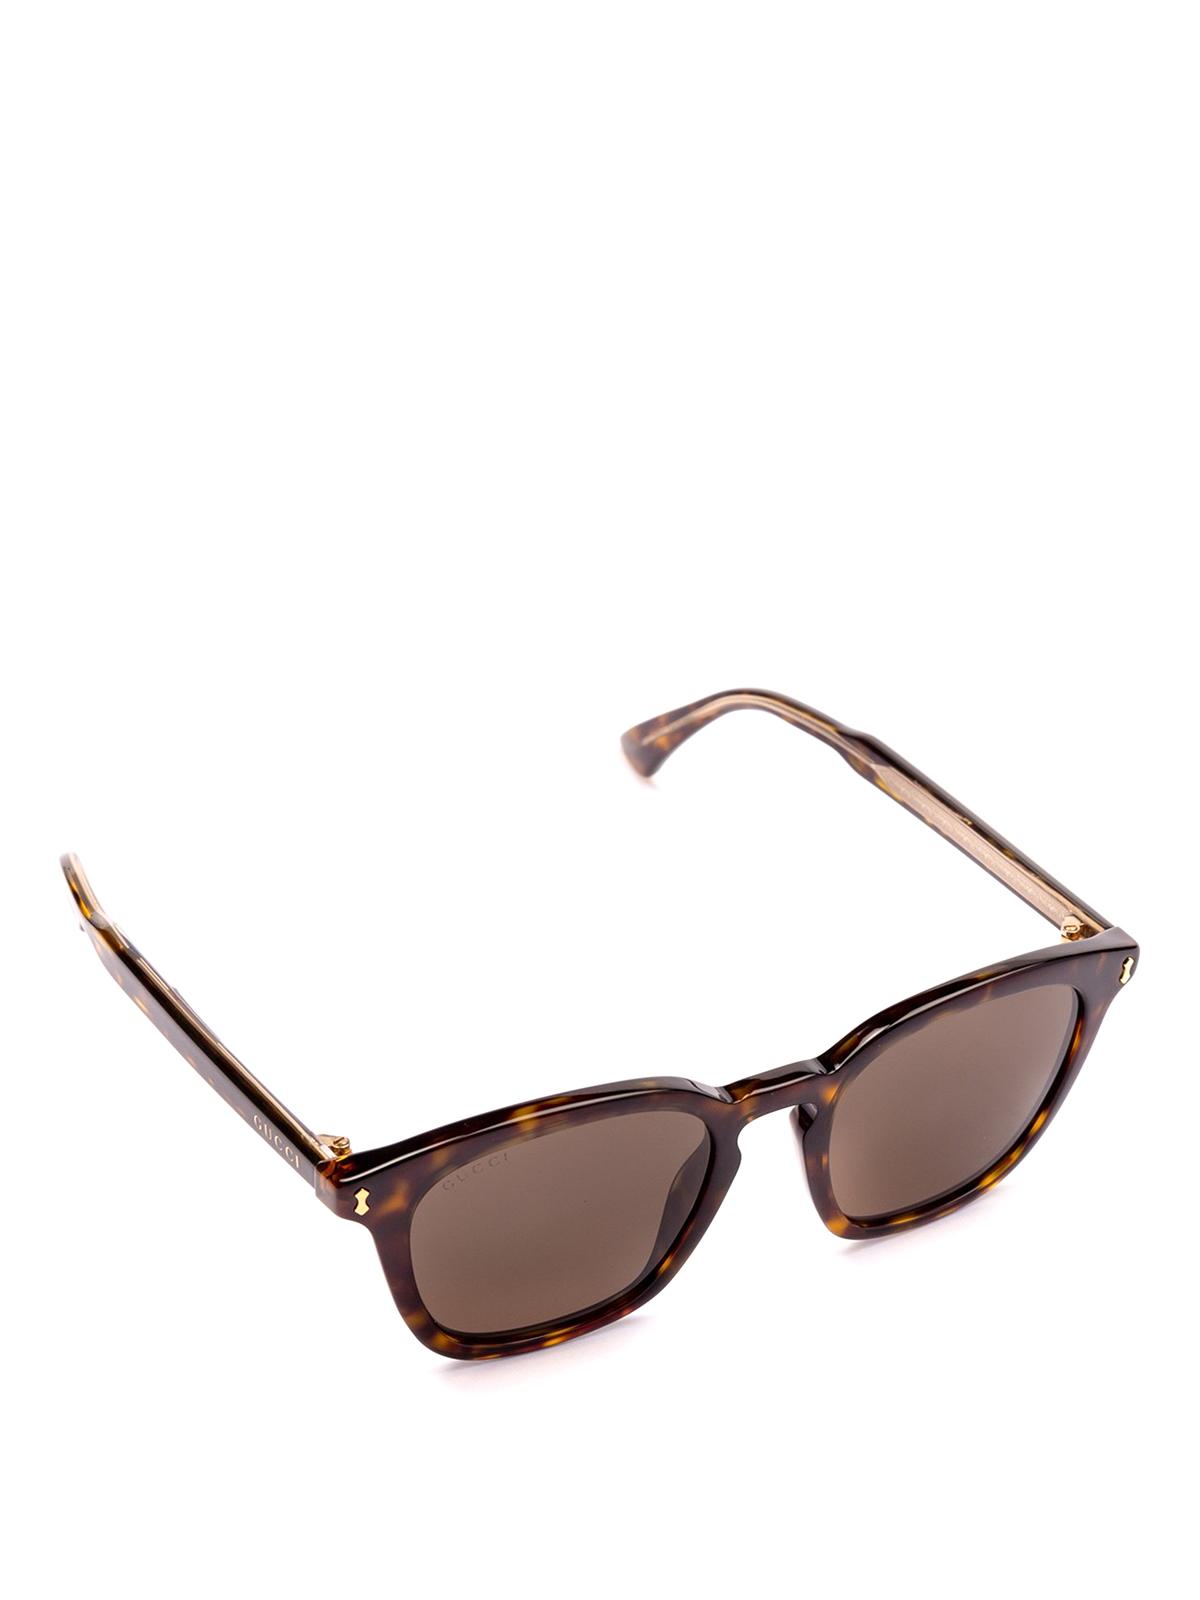 b1191be46d Gucci - Havana acetate square sunglasses - sunglasses - GG0125S 002